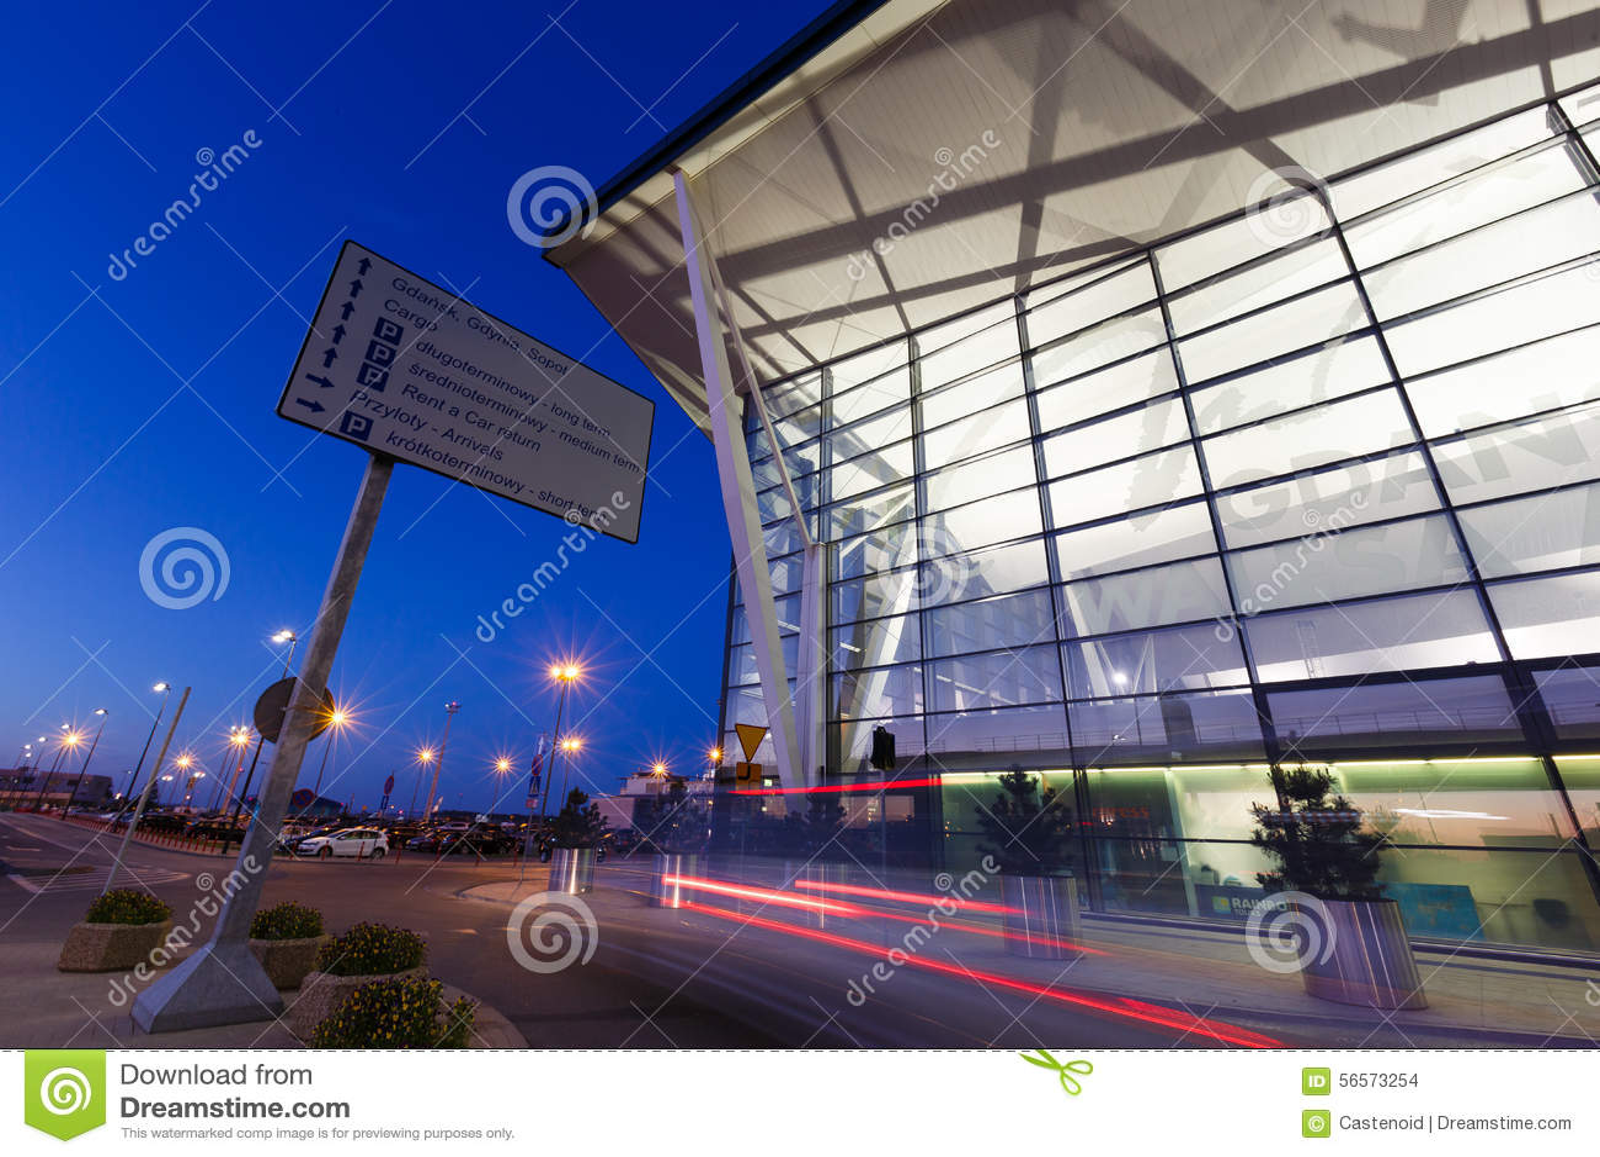 Download Σύγχρονη οικοδόμηση του αερολιμένα Lech Valesa στο Γντανσκ Εκδοτική Στοκ Εικόνα - εικόνα από aviations, γντανσκ: 56573254